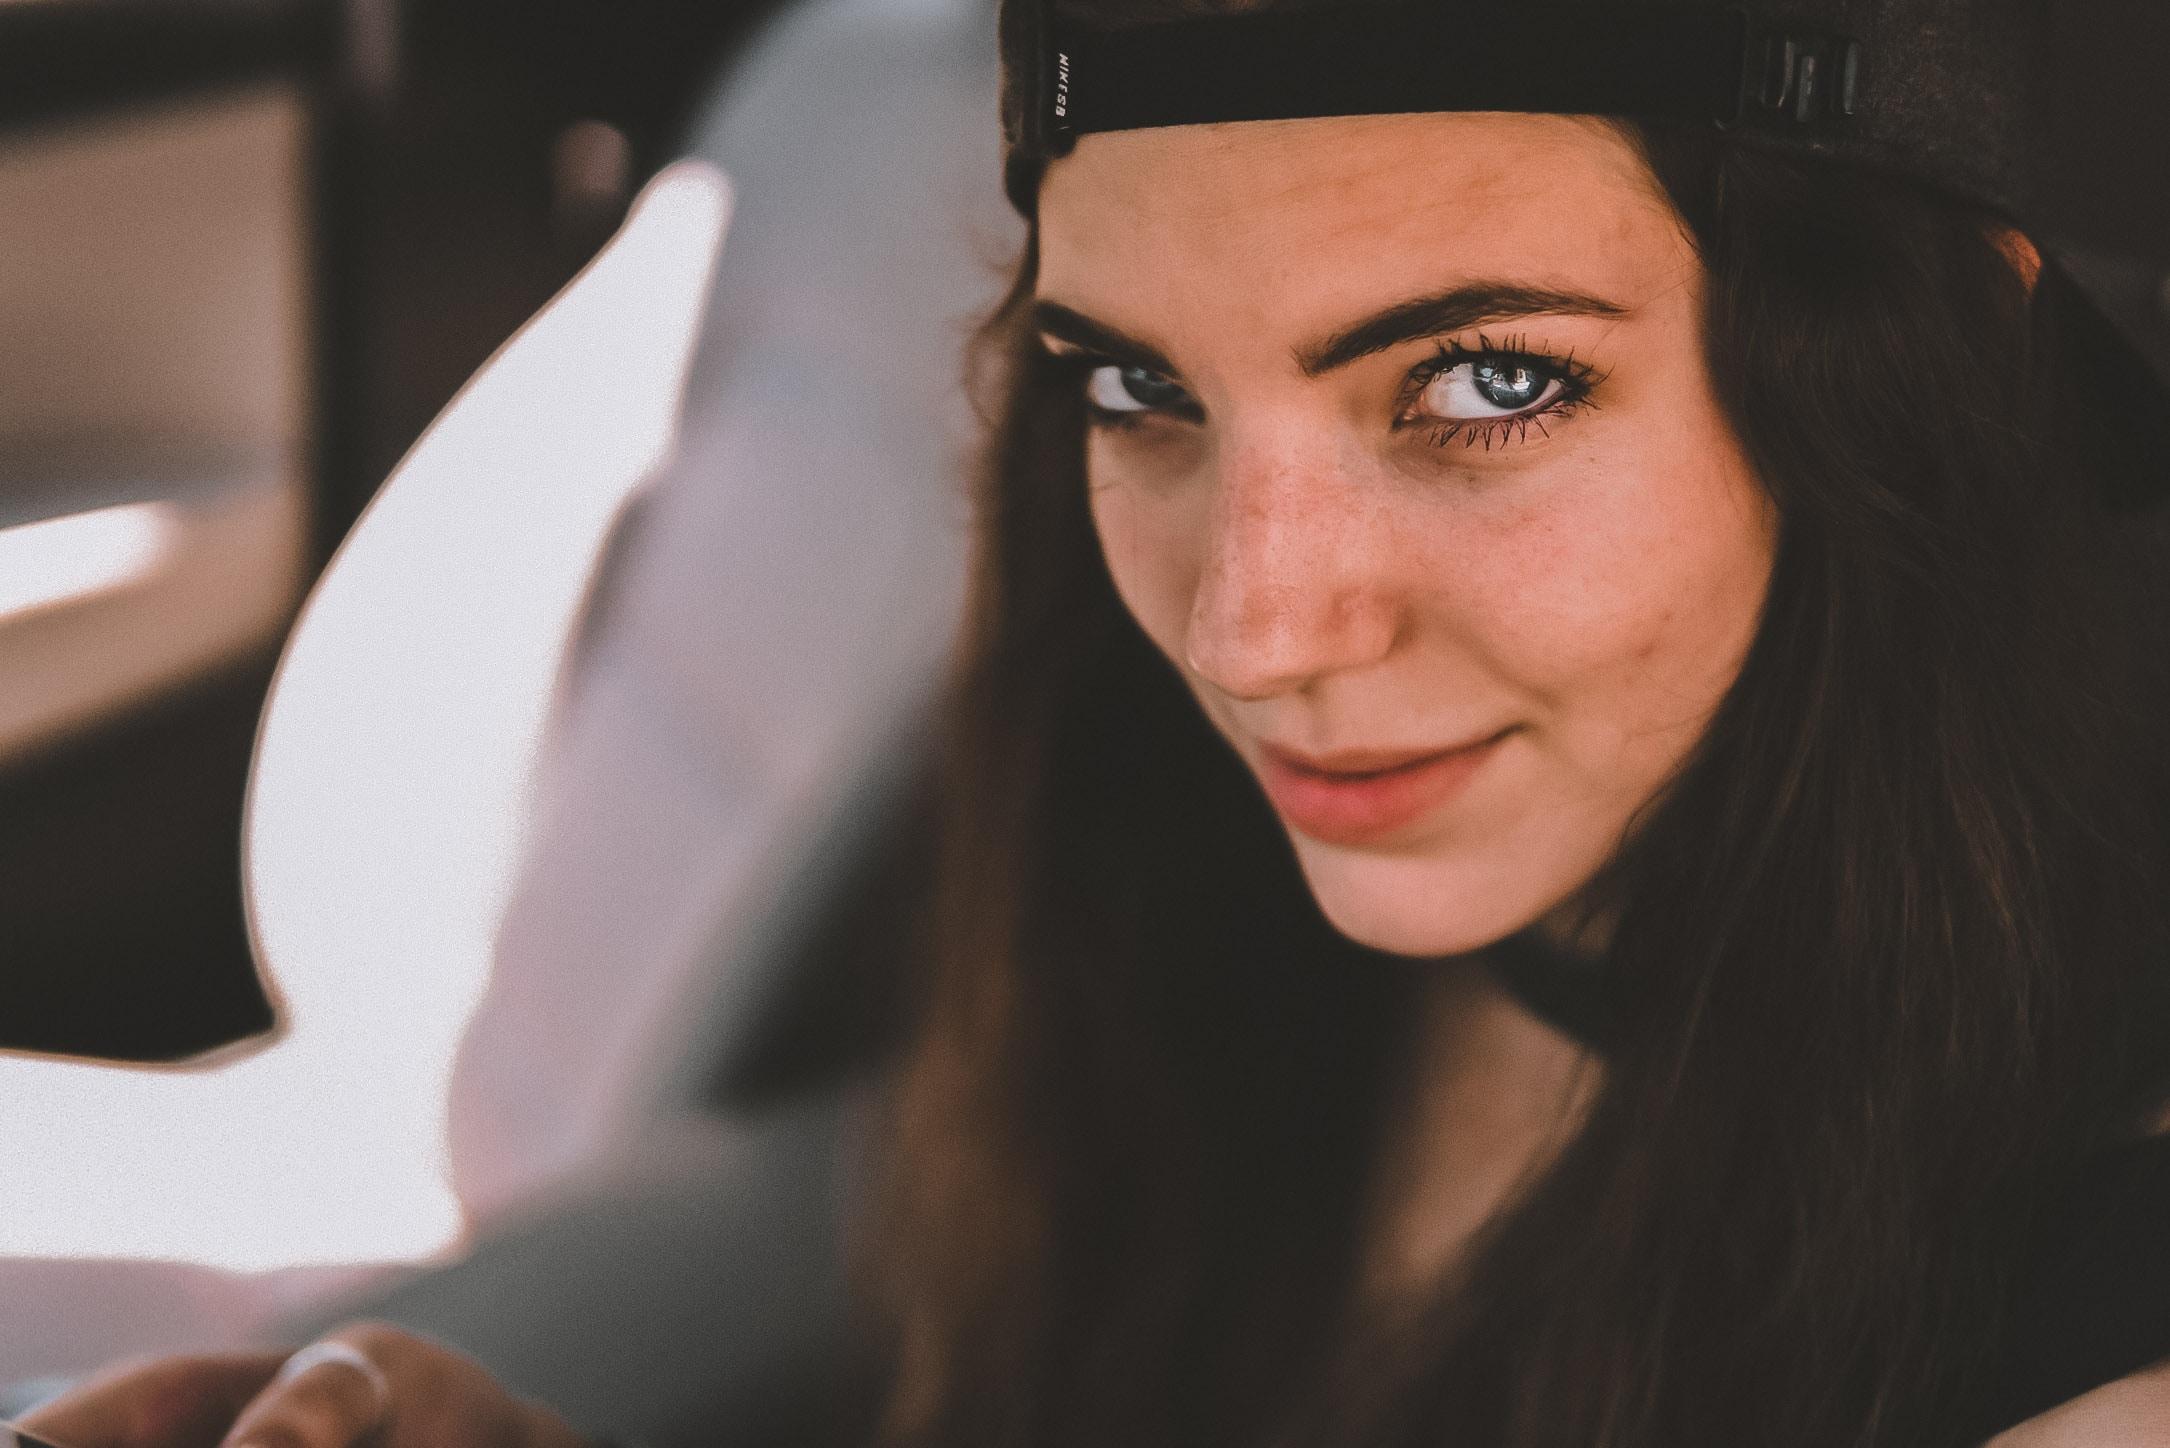 woman wearing cap